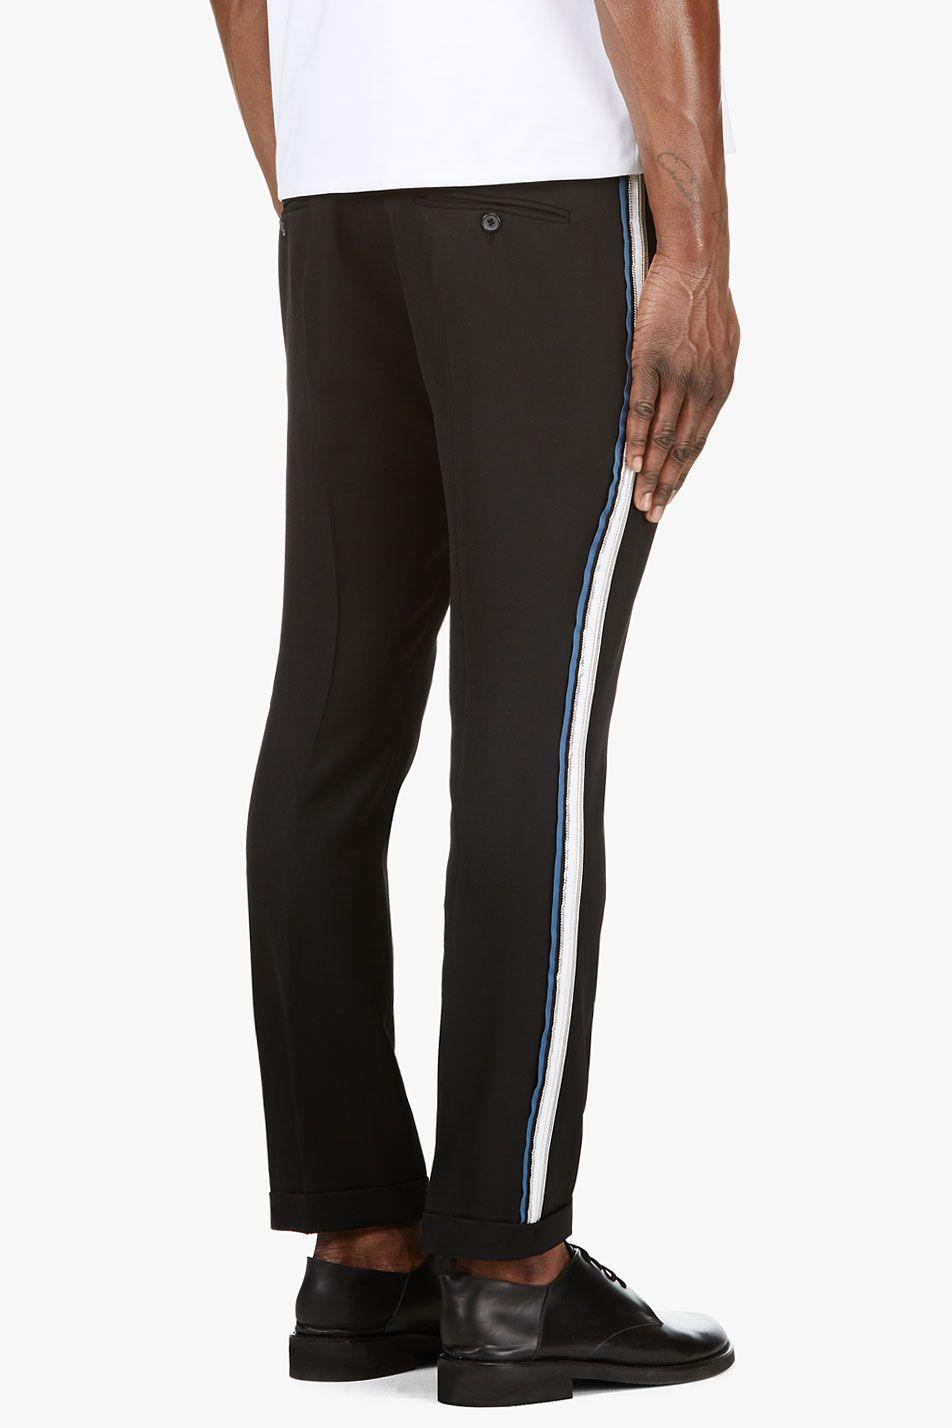 8e268b2224a0 BALMAIN Black Slim Side Stripe Fit Trousers | mens details ...